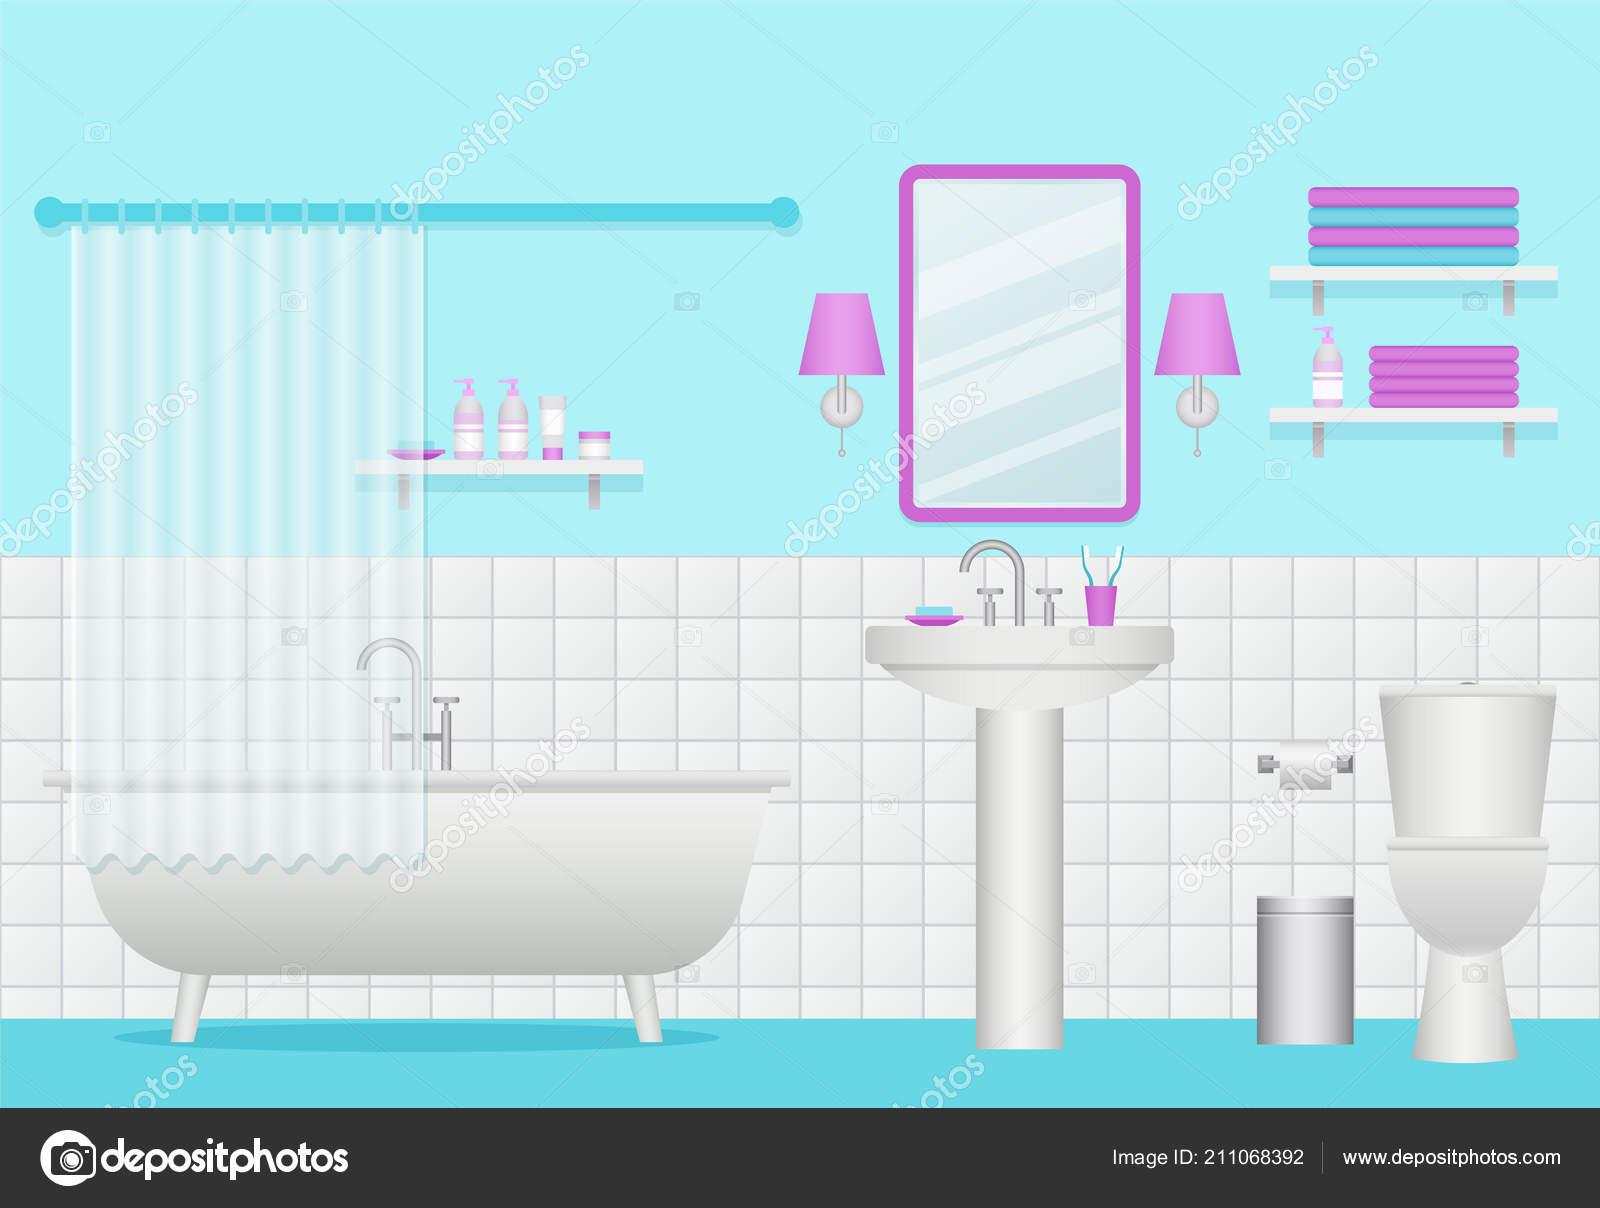 Bathroom Interior Vector Toilet Furniture Plumbing Flat Design Cartoon Room Vector Image By Maradaisy Vector Stock 211068392